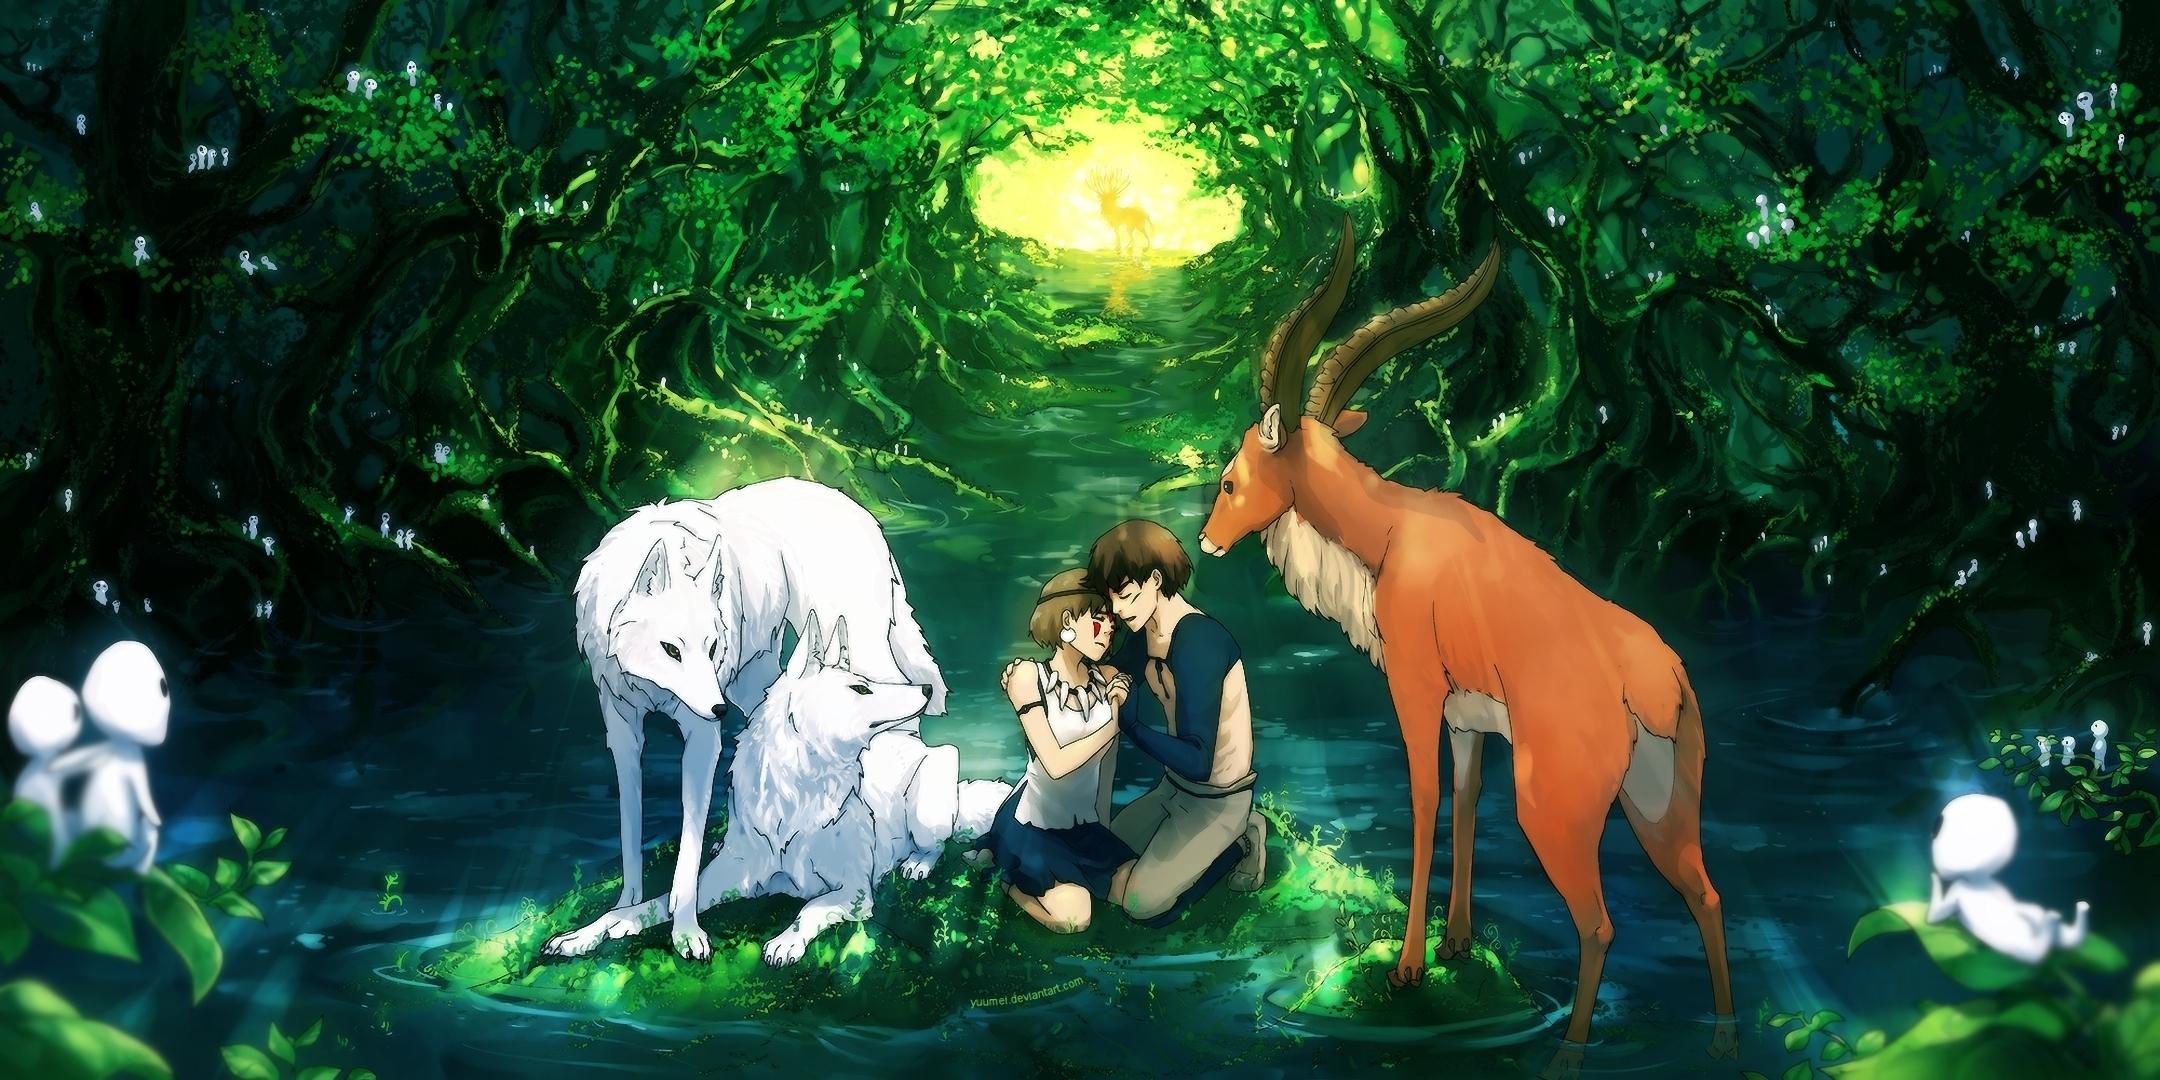 Hd Wallpaper Background Image Id X Movie Princess Mononoke